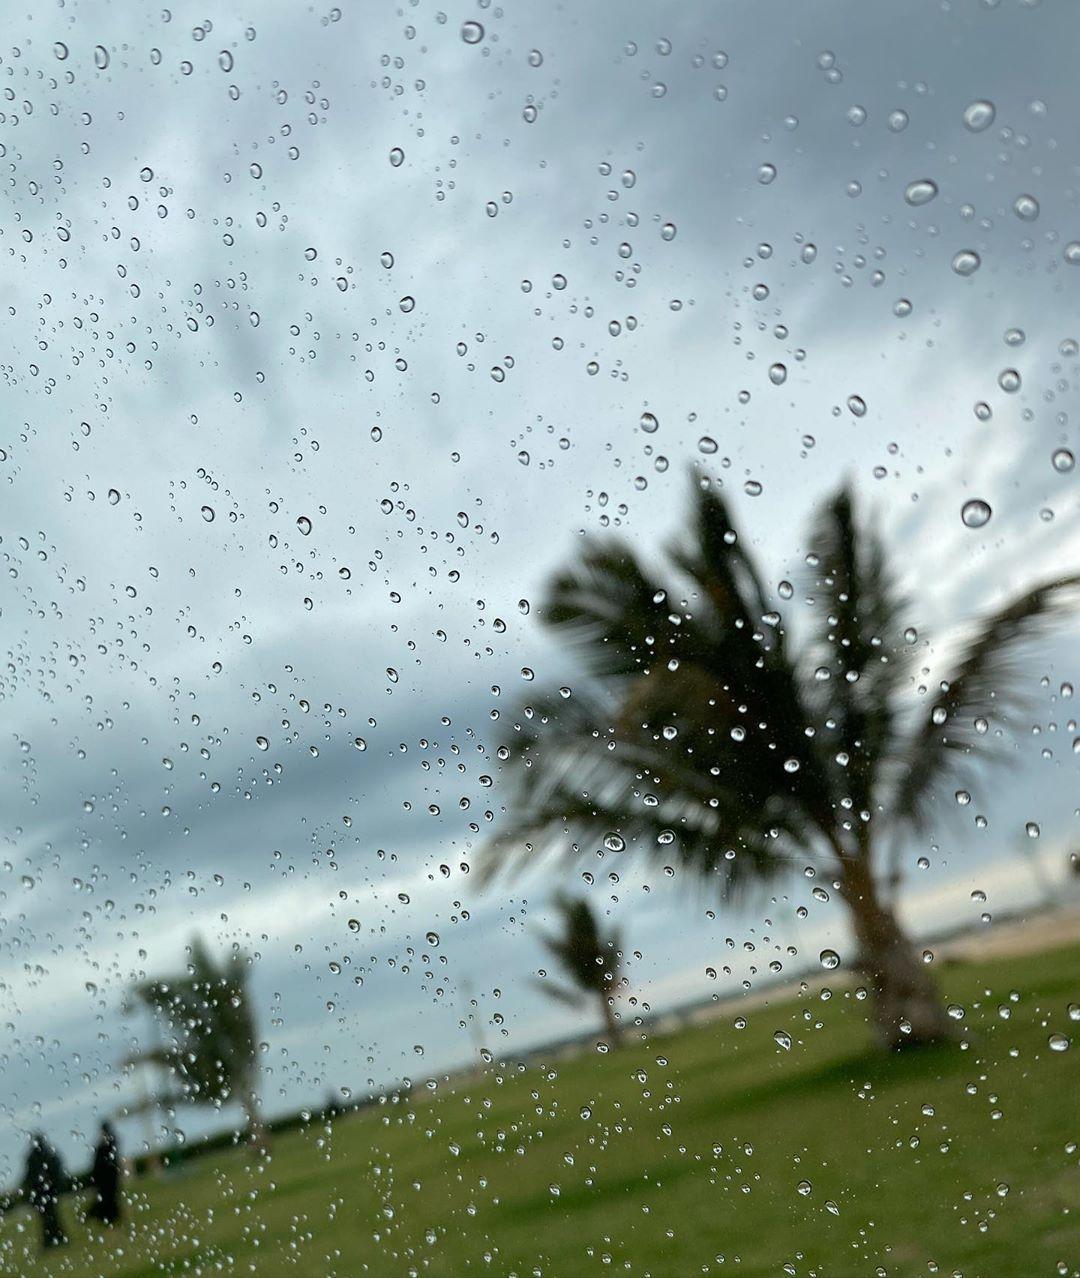 Rain makes everything beautiful💕🌧✨ #rain #rainday #rainwater #weather #saudiarabia #ksa #weatheringwithyou #2020 #rainydays☔️ #byme #picture #water #2020rain #amazing #niceweather #saudiarabia🇸🇦 #🌧 #pictureday #ksa🇸🇦 #مطر #جو #مطرالسعوديه #جوجميل